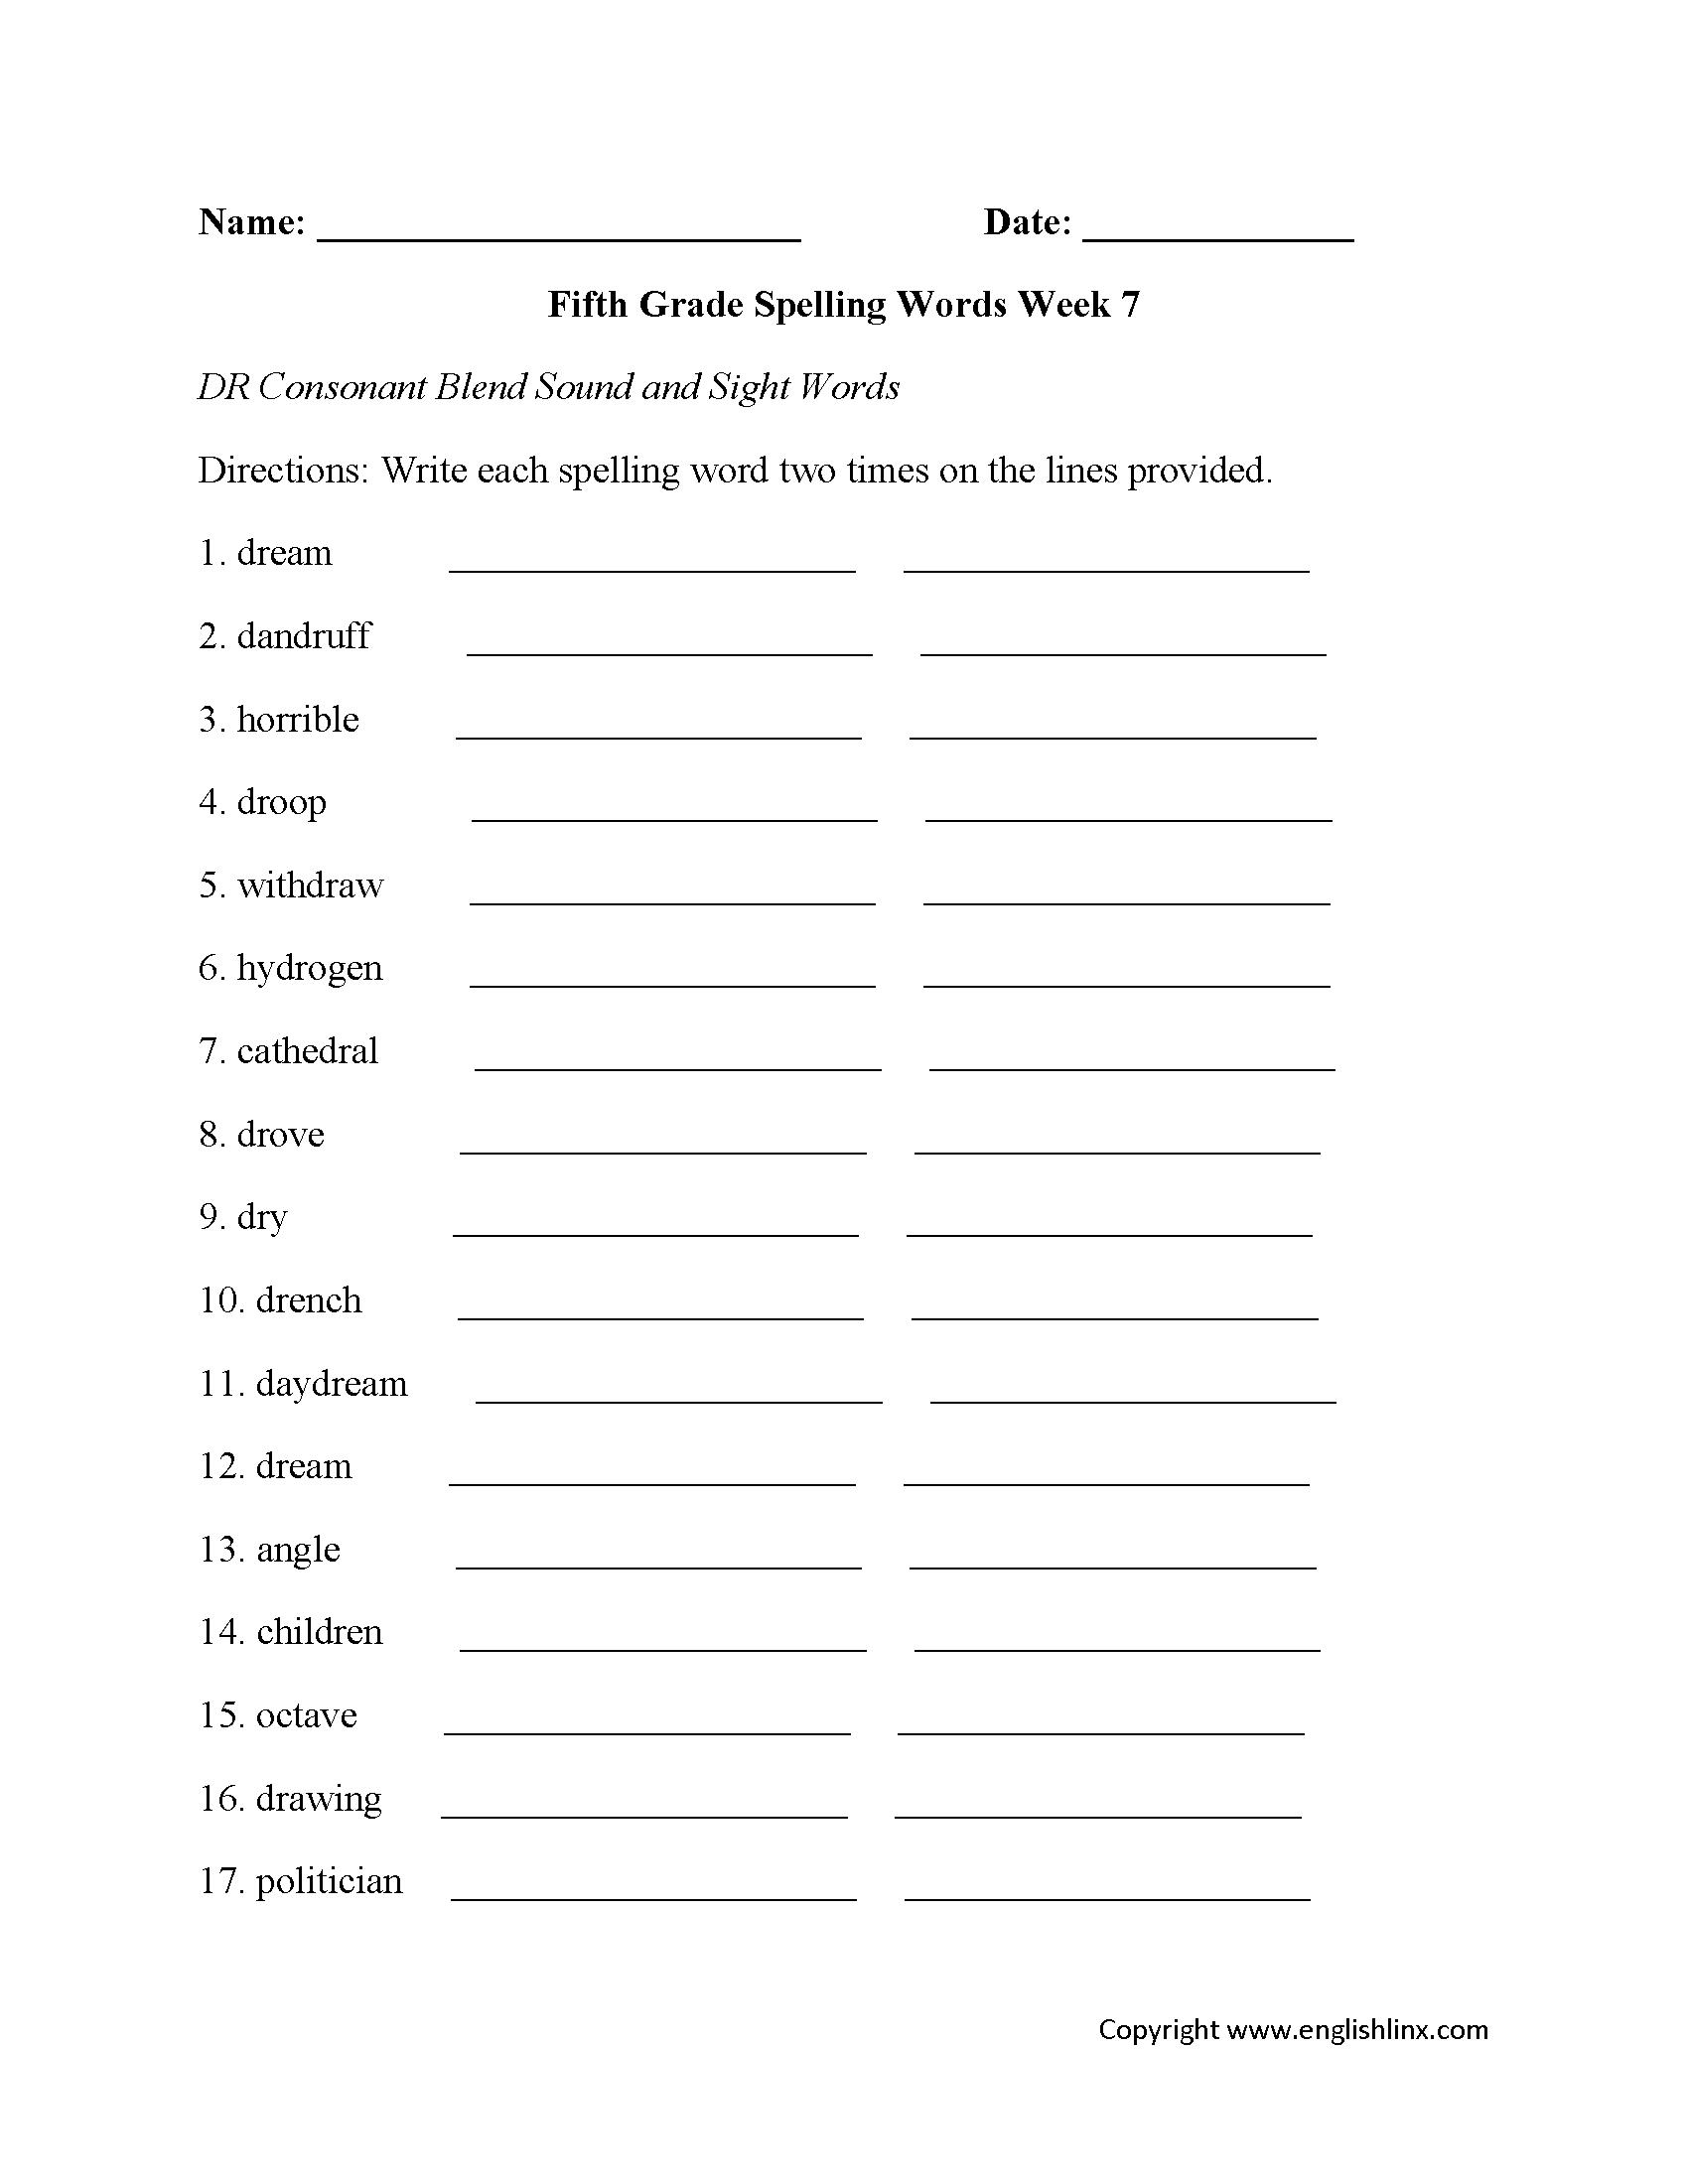 Spelling Worksheets | Fifth Grade Spelling Worksheets